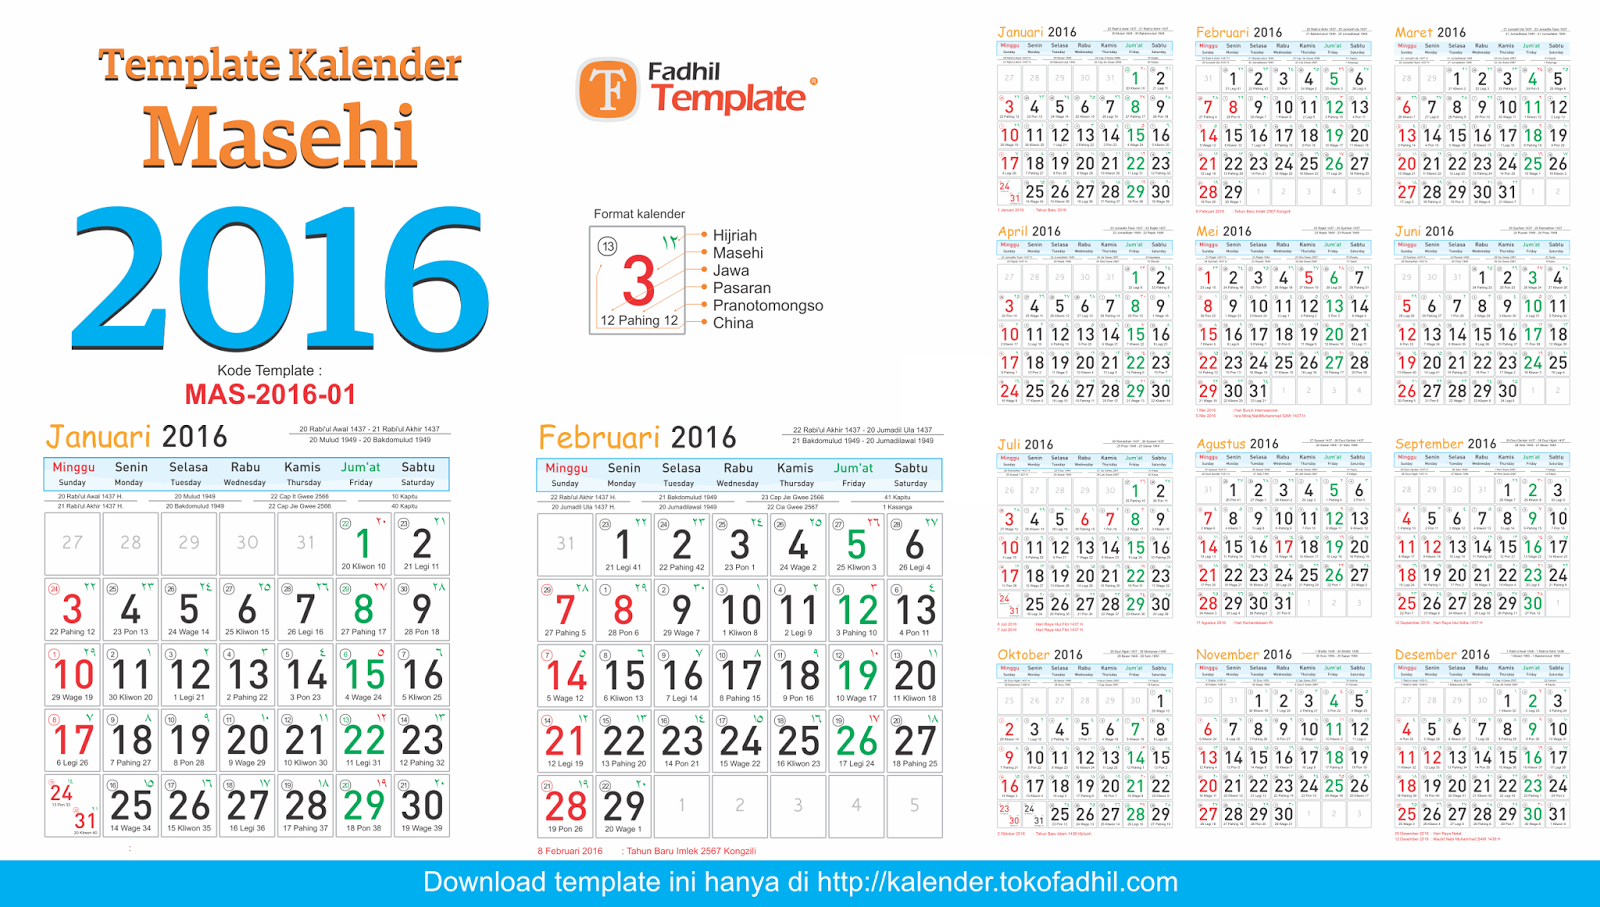 pusat template kalender template kalender 2016 corel editable cdr ai psd pdf photoshop telah. Black Bedroom Furniture Sets. Home Design Ideas